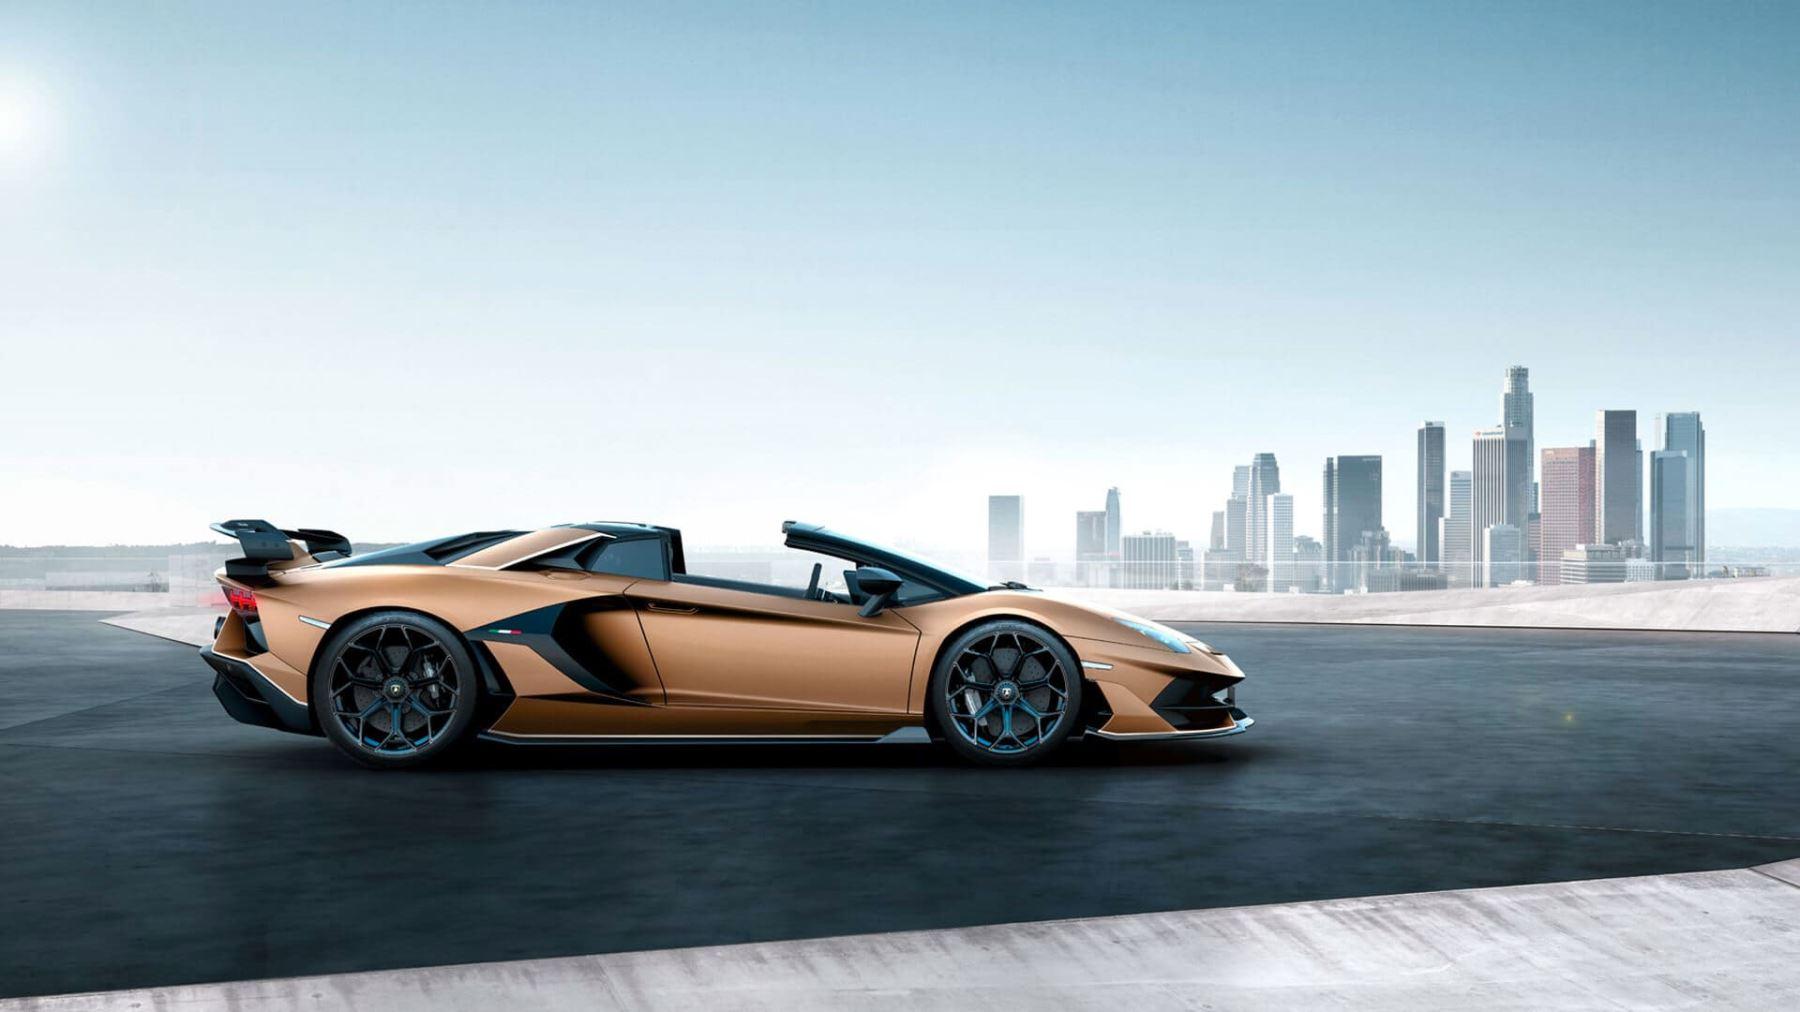 Lamborghini Aventador SVJ Roadster - Real emotions shape the future image 5